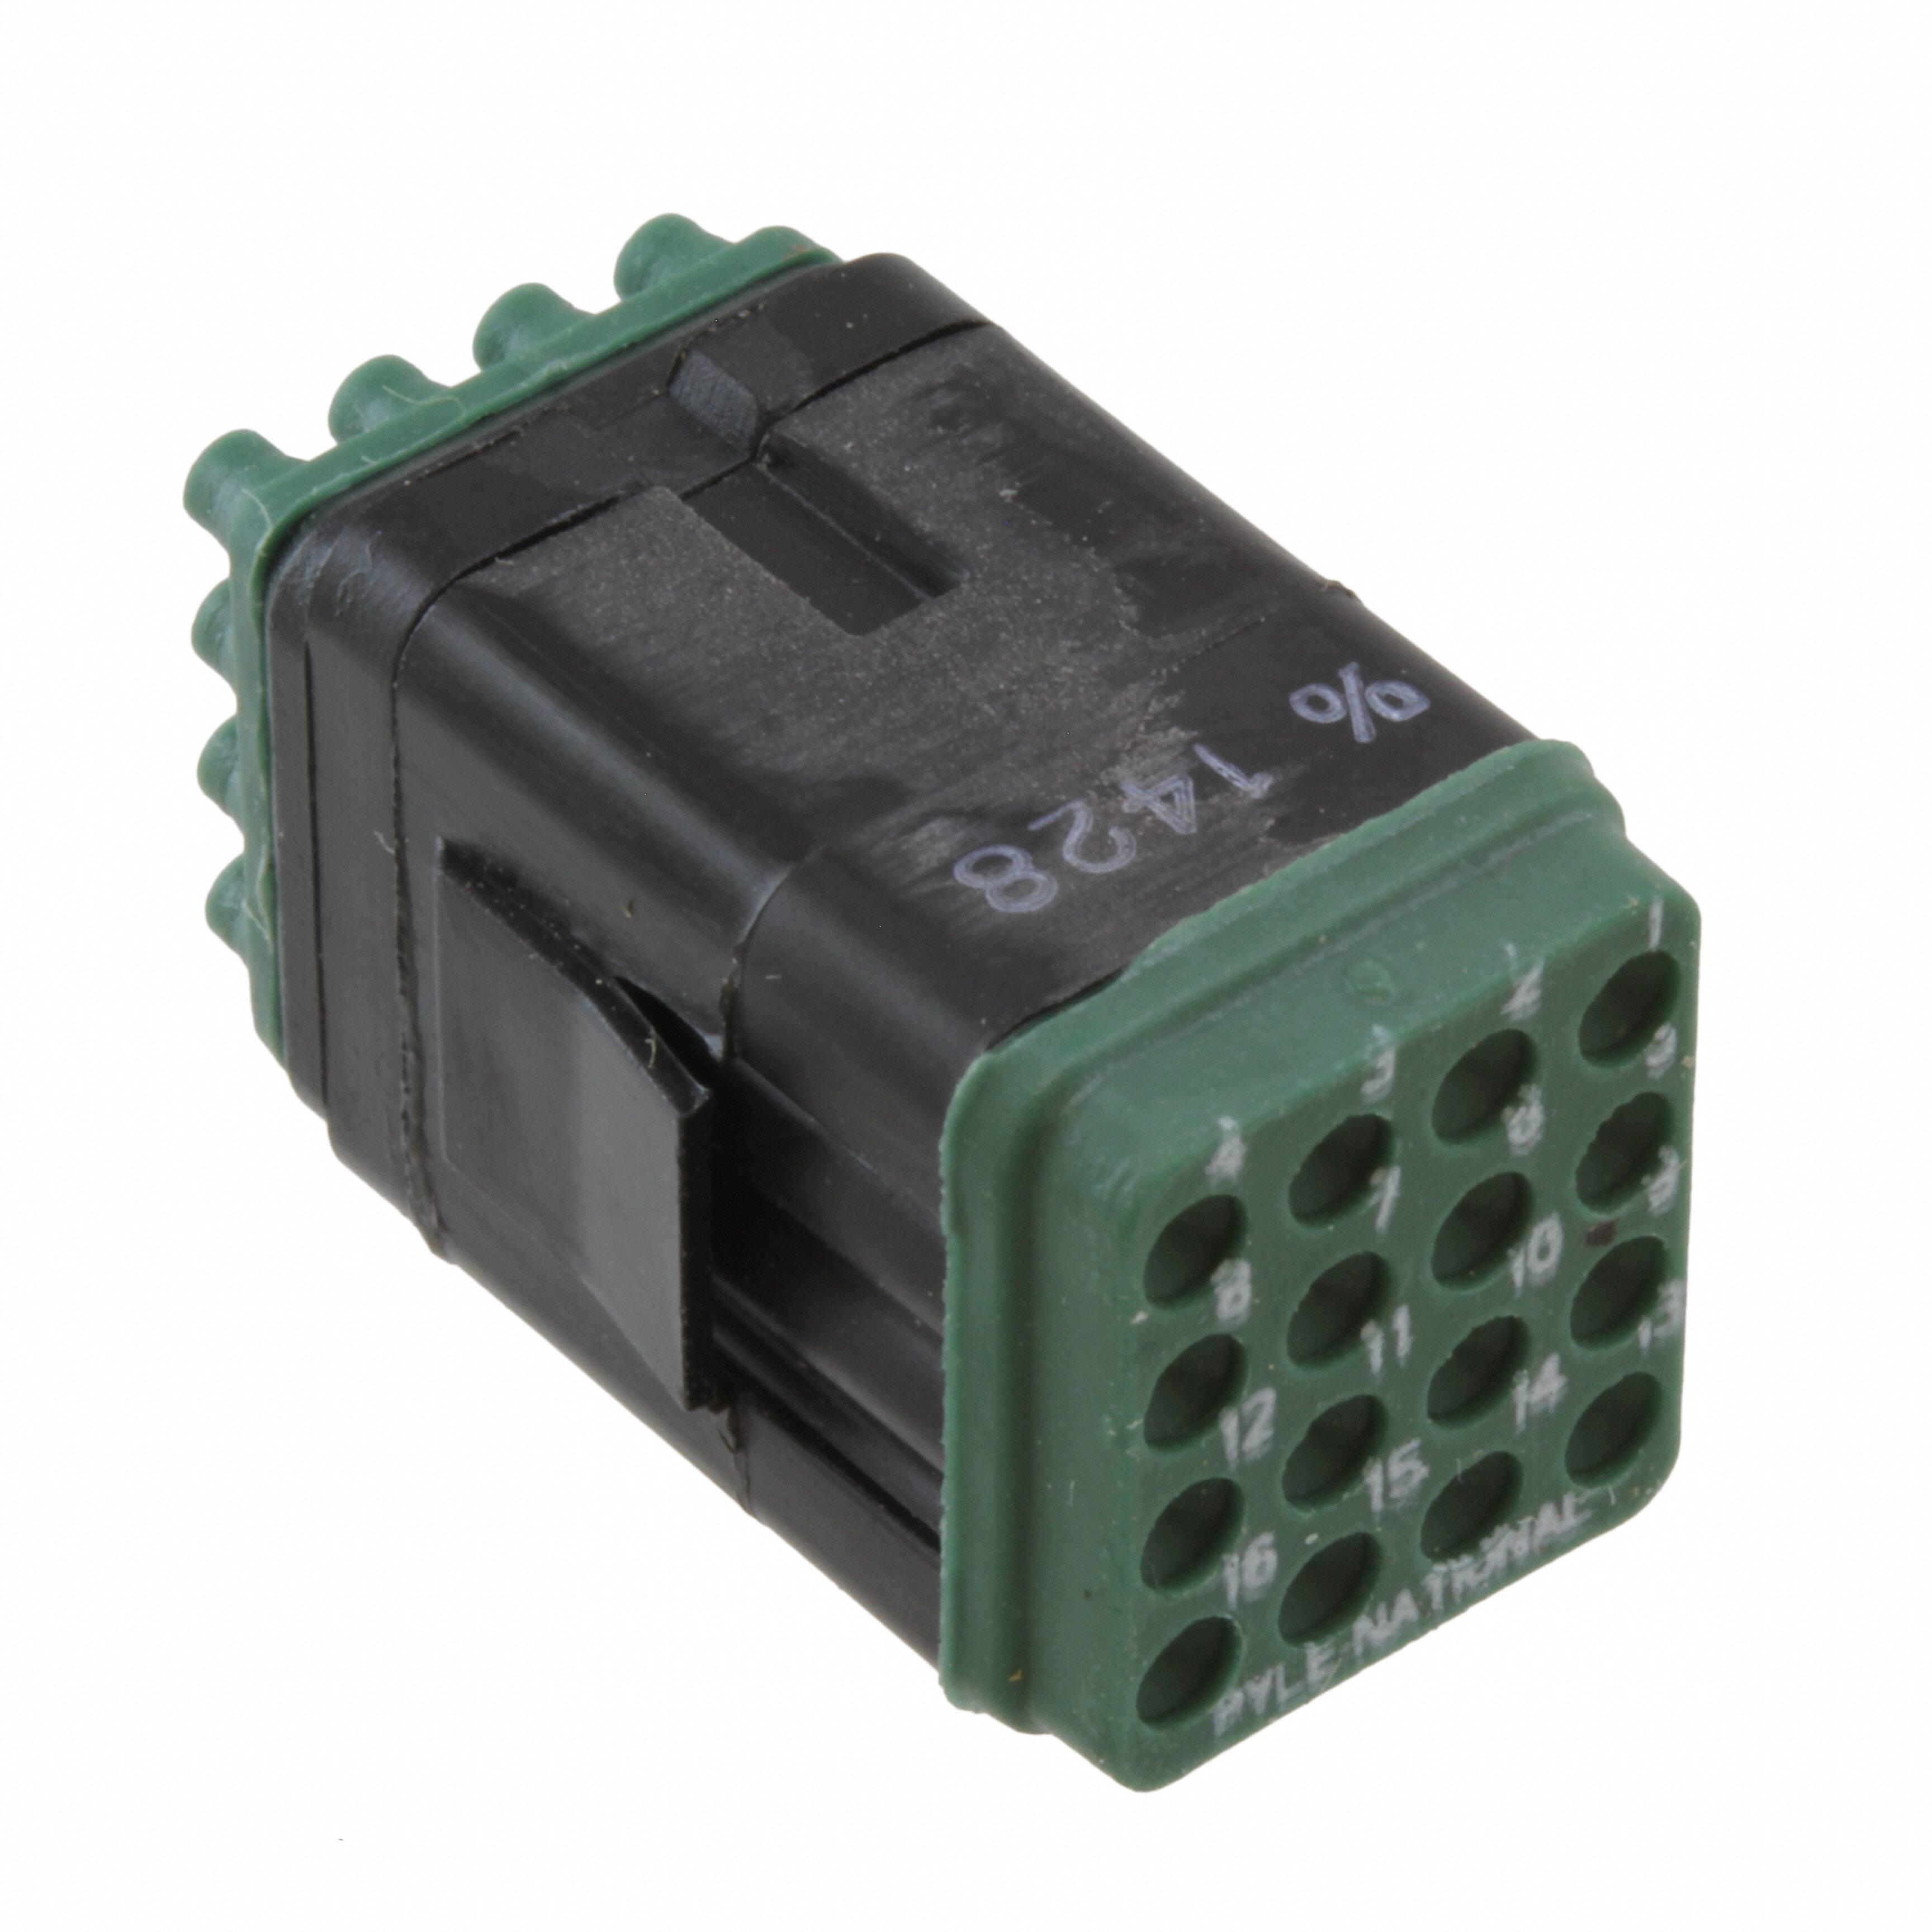 LMD-4003-P_端子接线盒系统